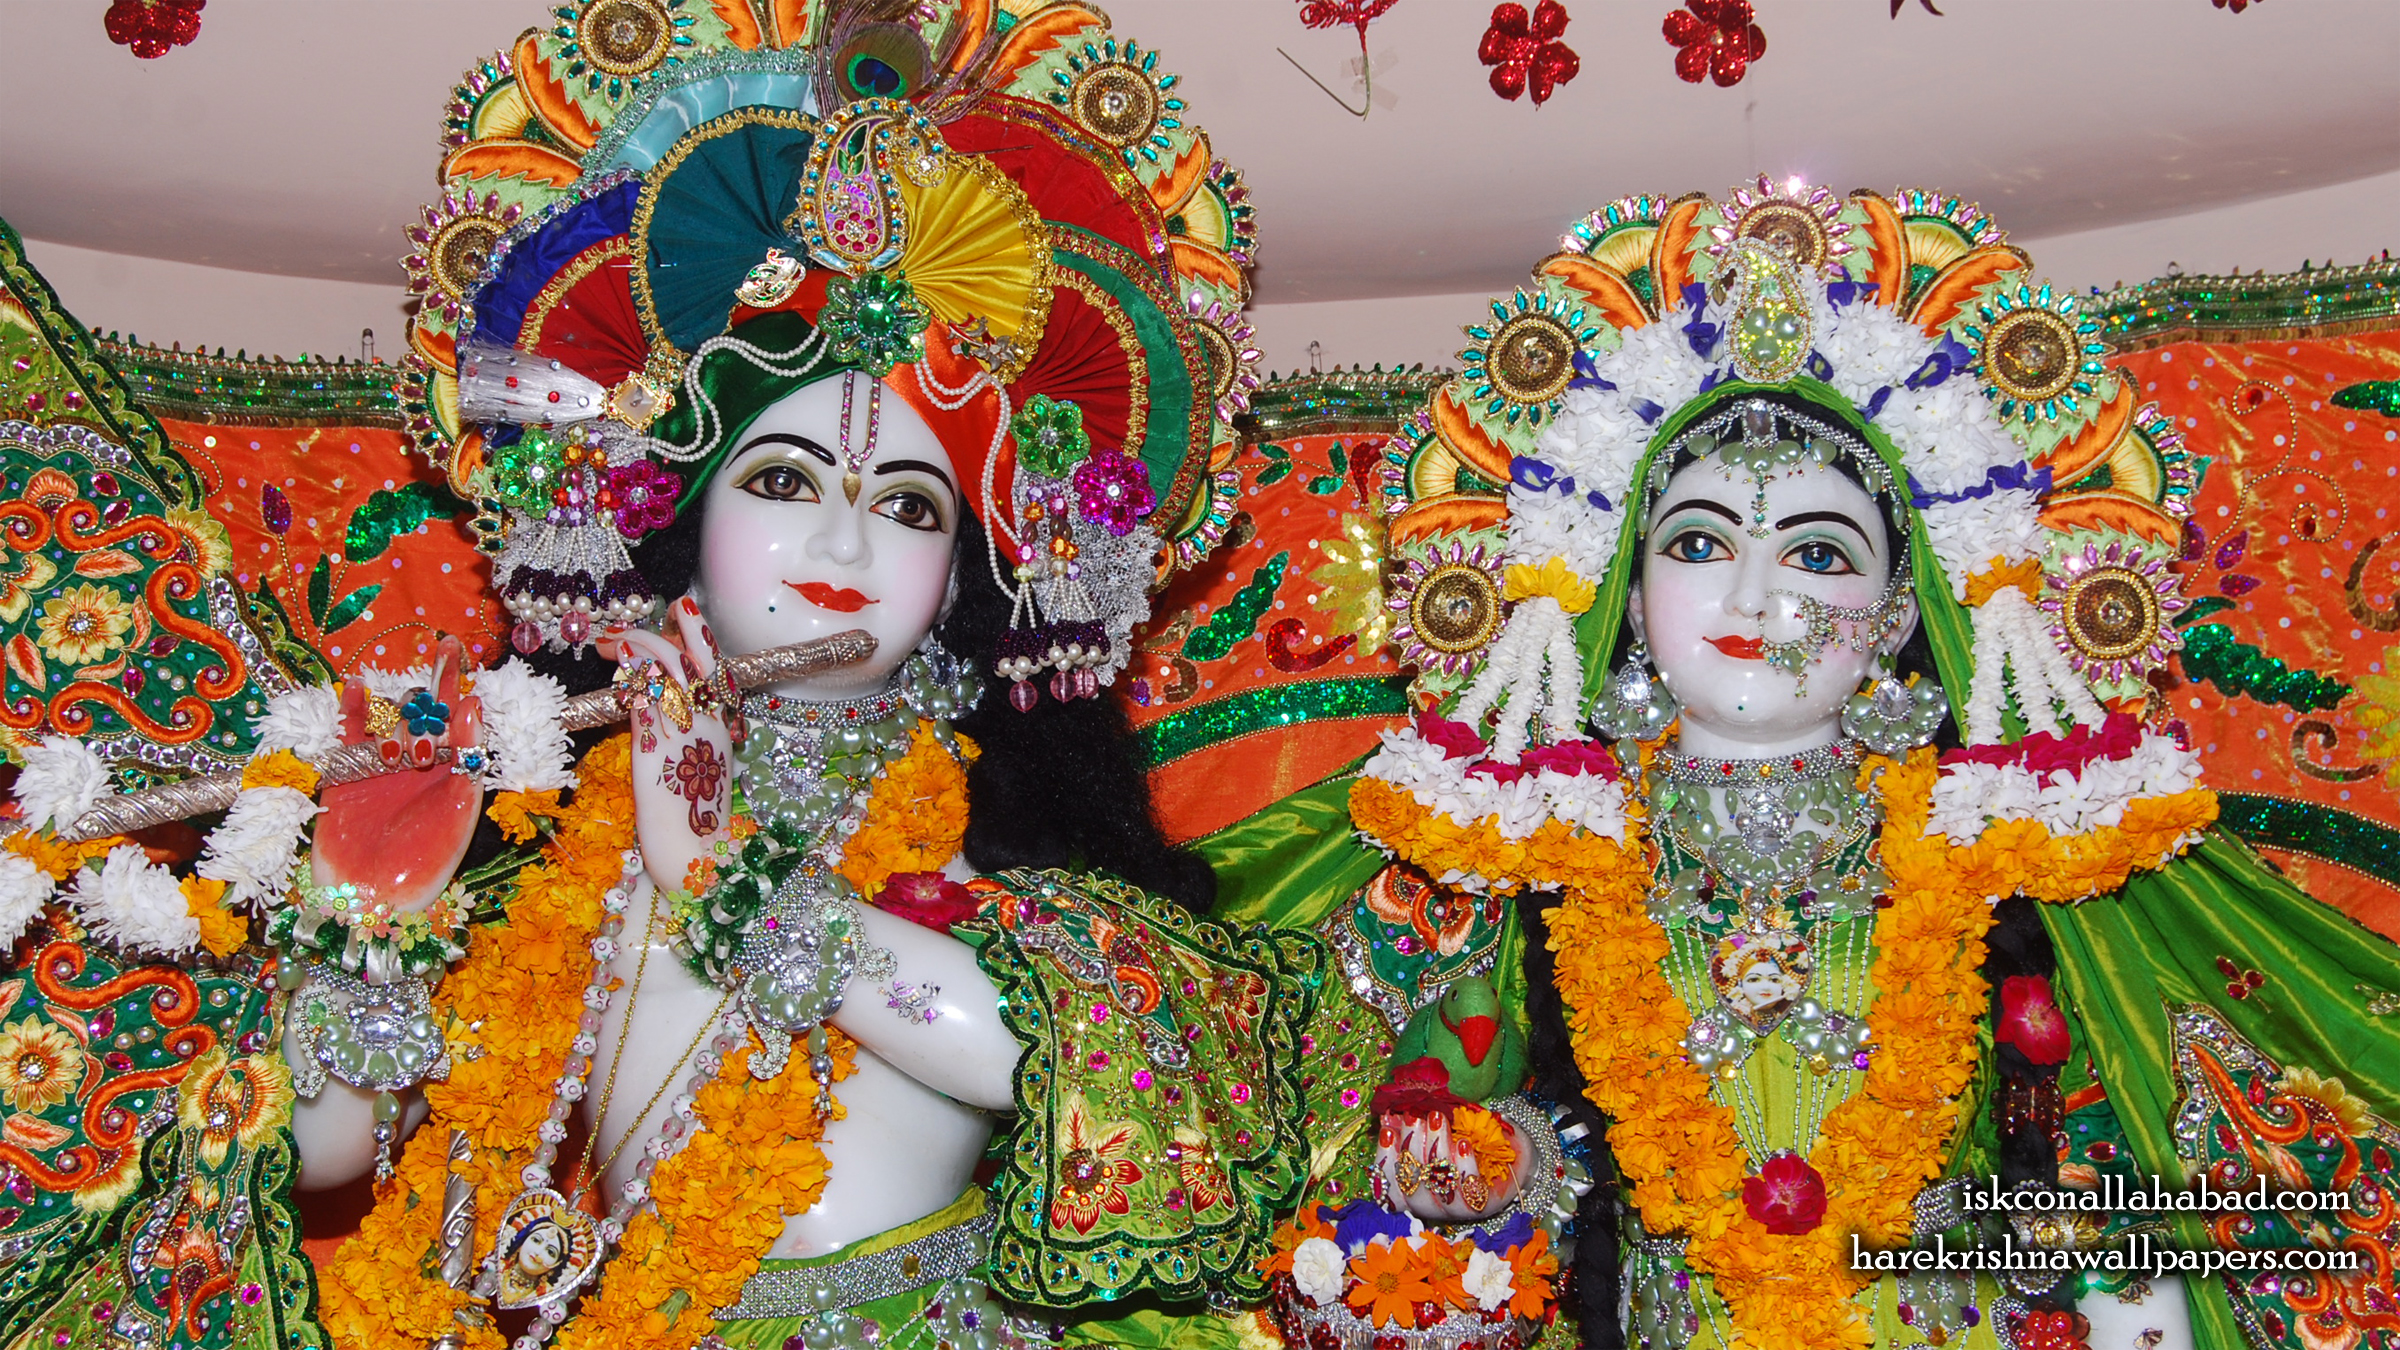 Sri Sri Radha Venimadhava Close up Wallpaper (004) Size 2400x1350 Download